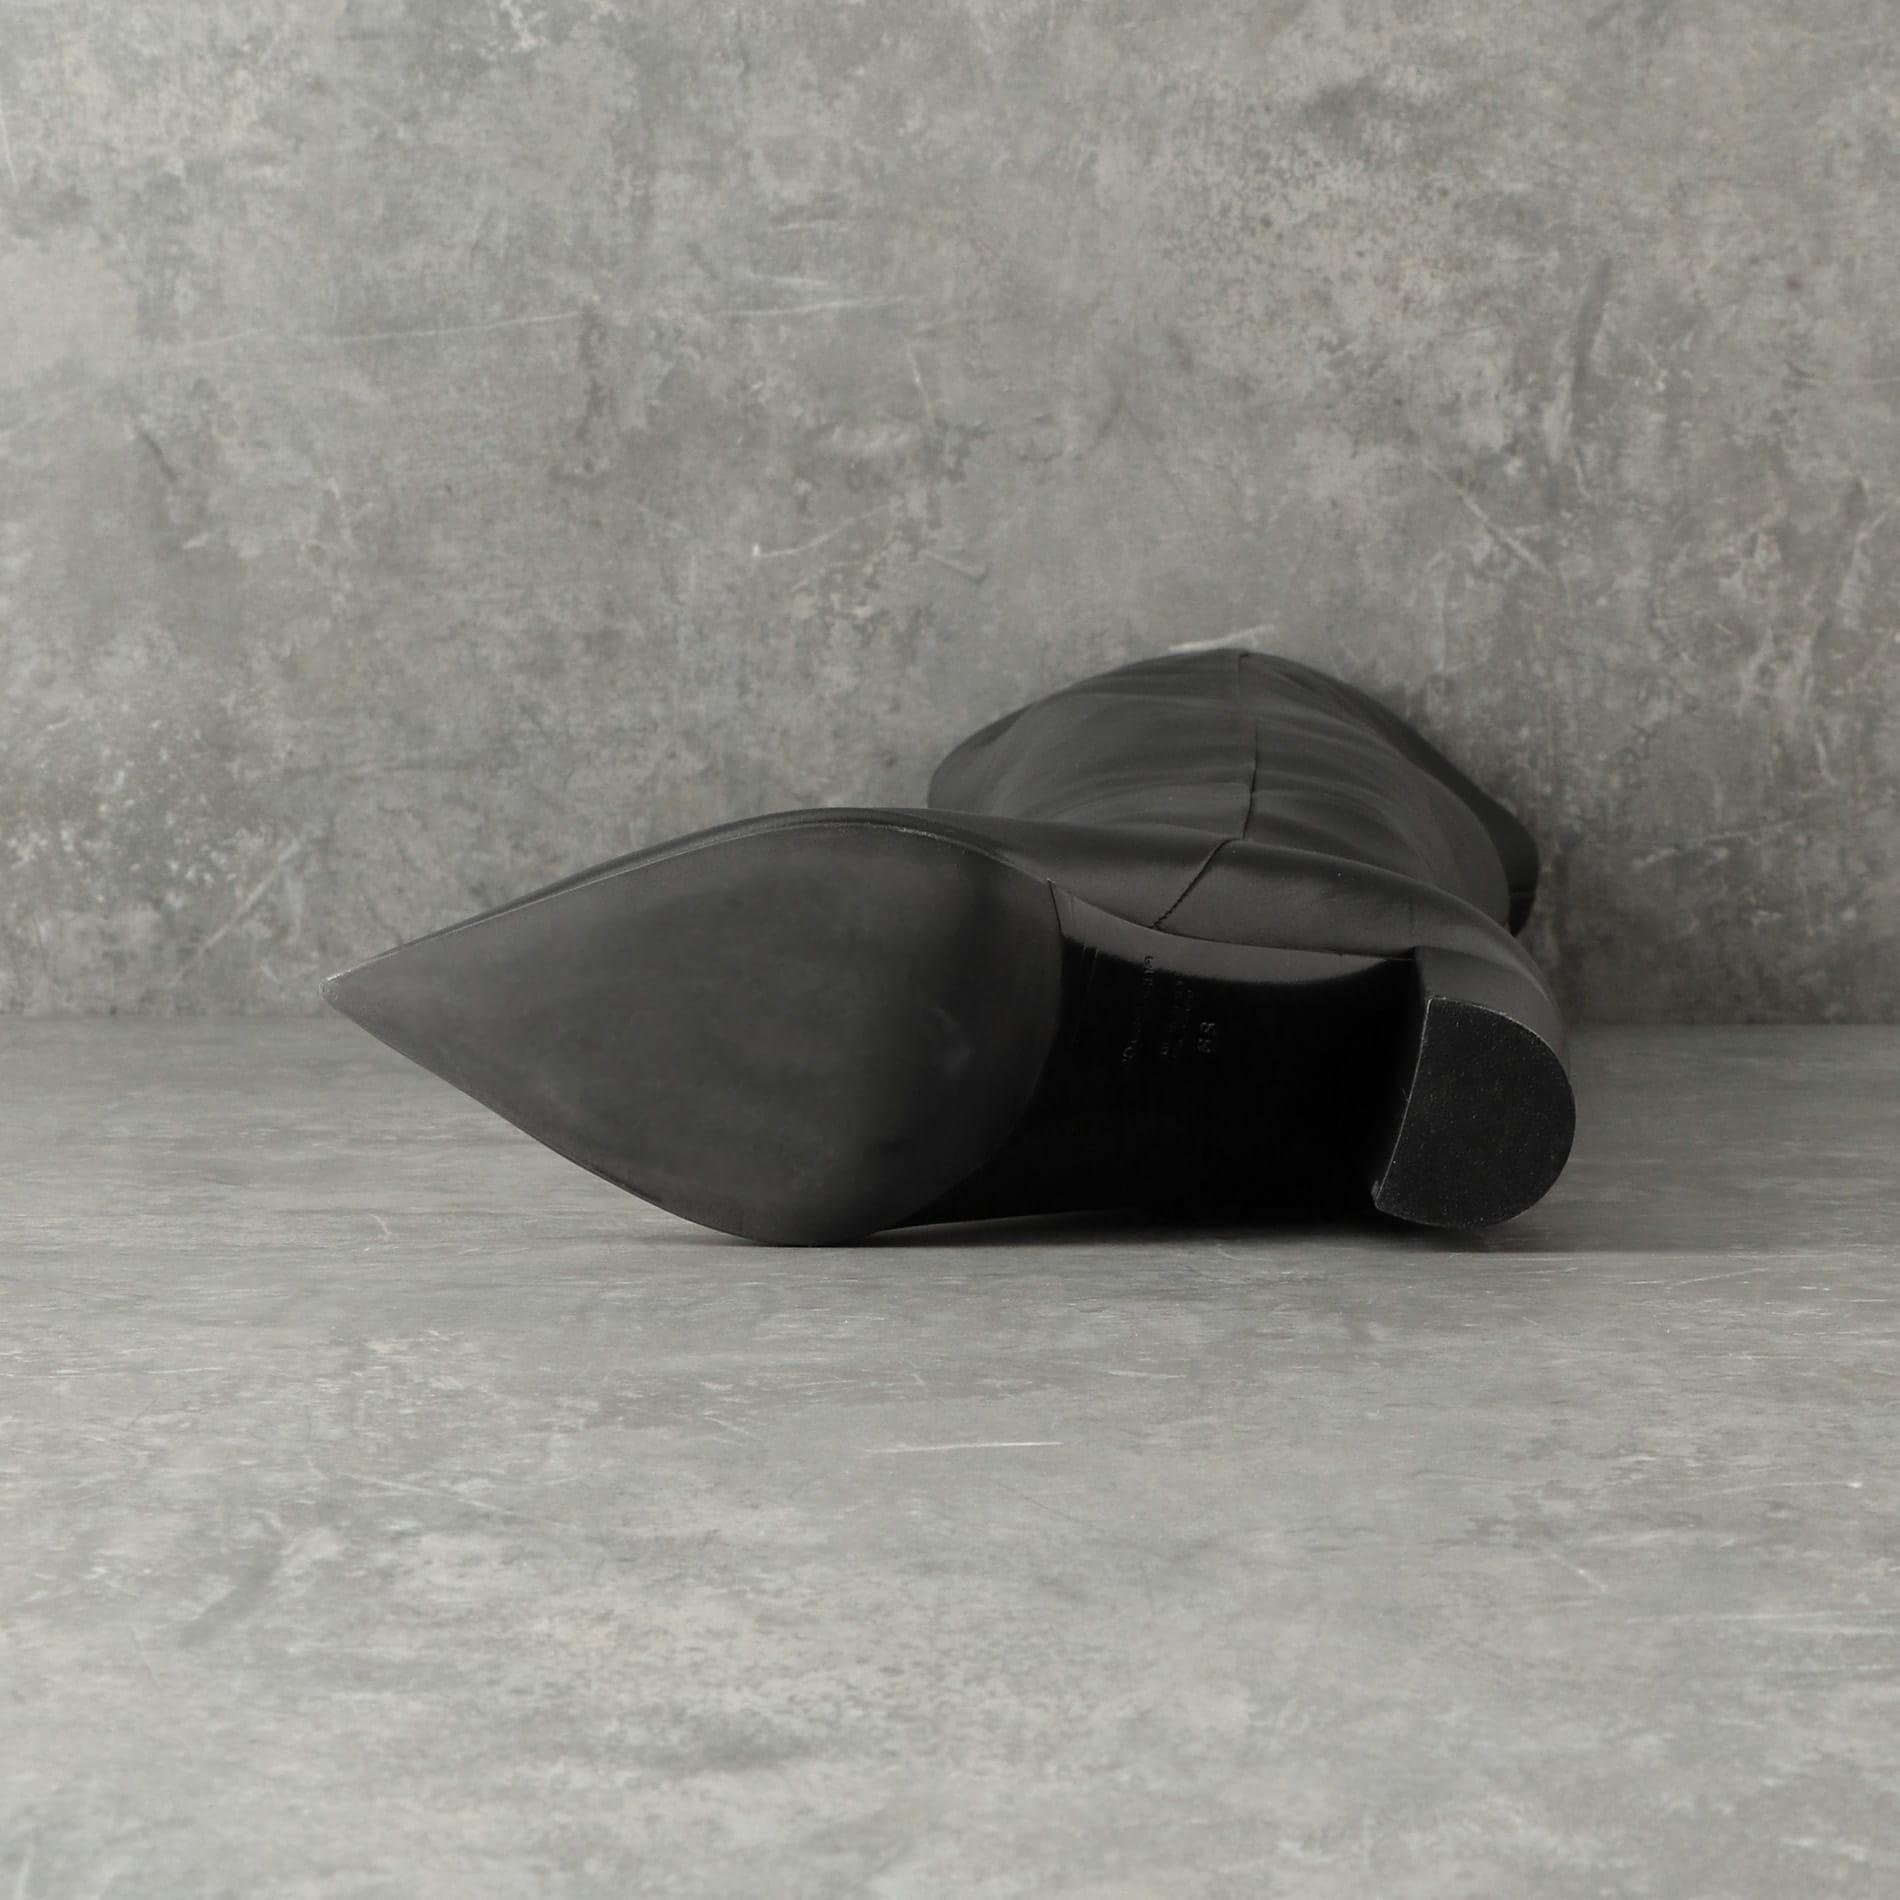 【aldo castagna】 ニーハイロングブーツ